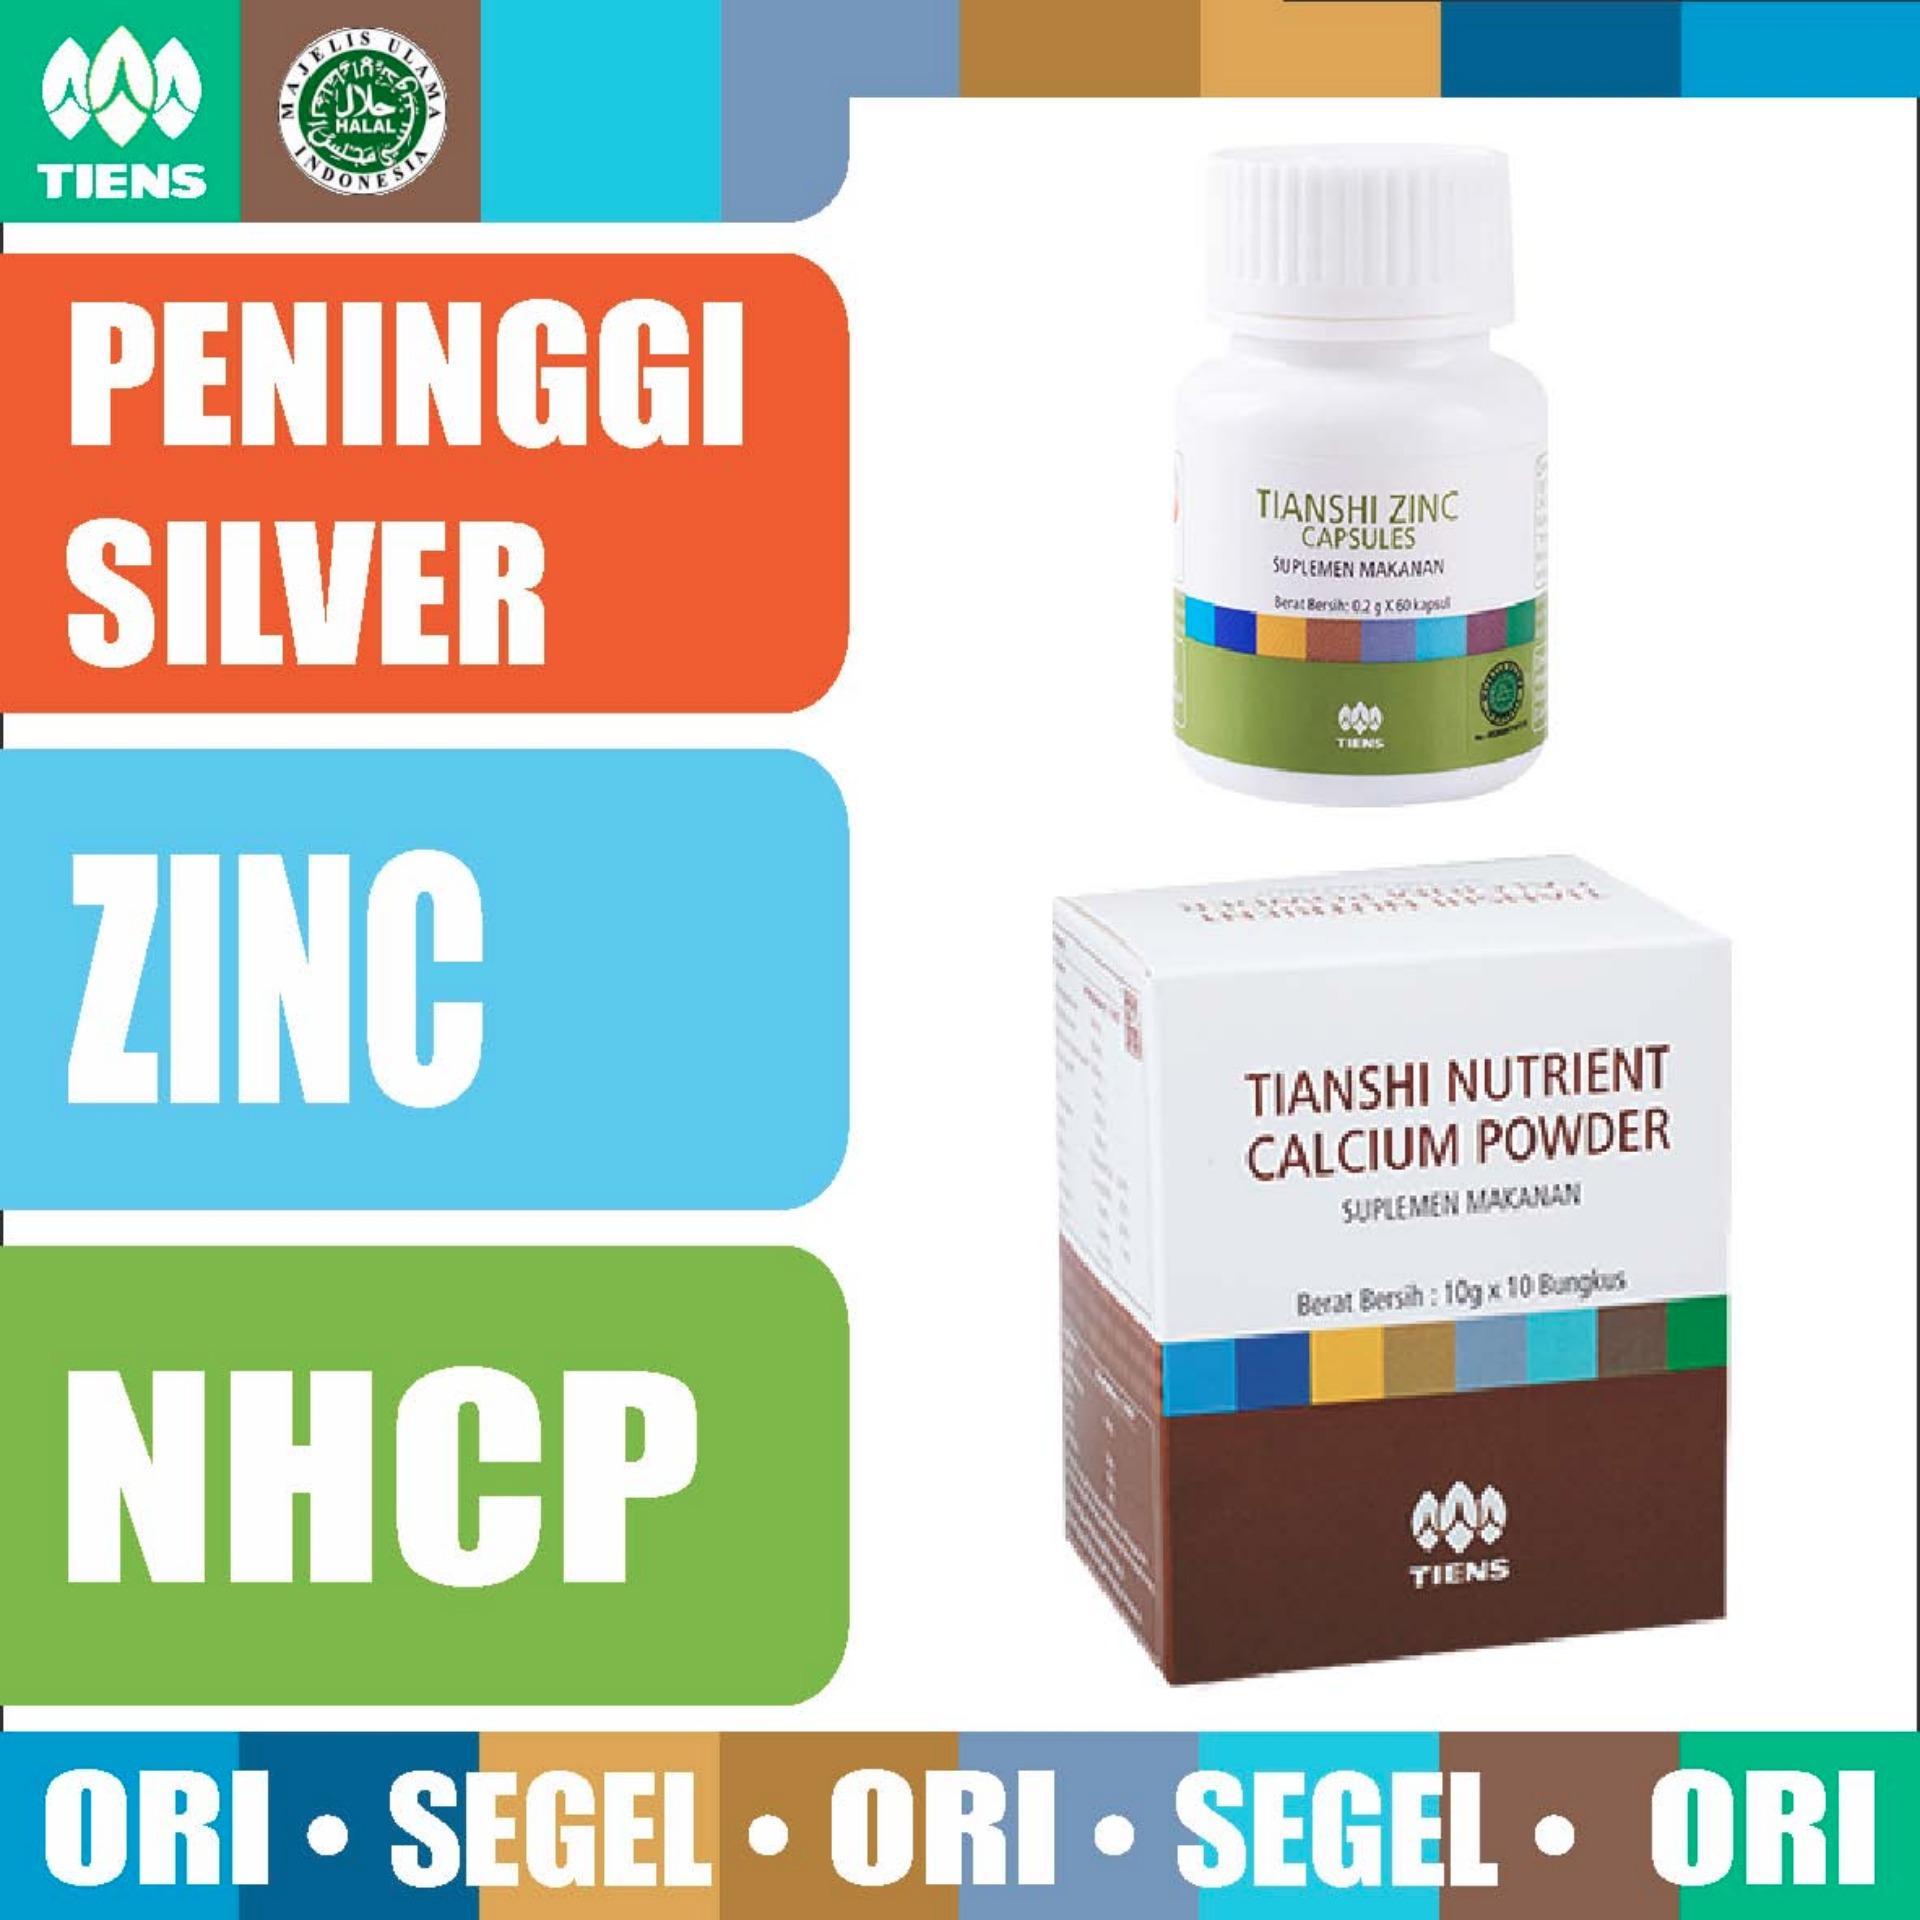 Cheap online Tiens PAKET PENINGGI BADAN SILVER - Zinc - Nutrient Calcium PowderNHCP Kalsium - Tianshi Asli Herbal